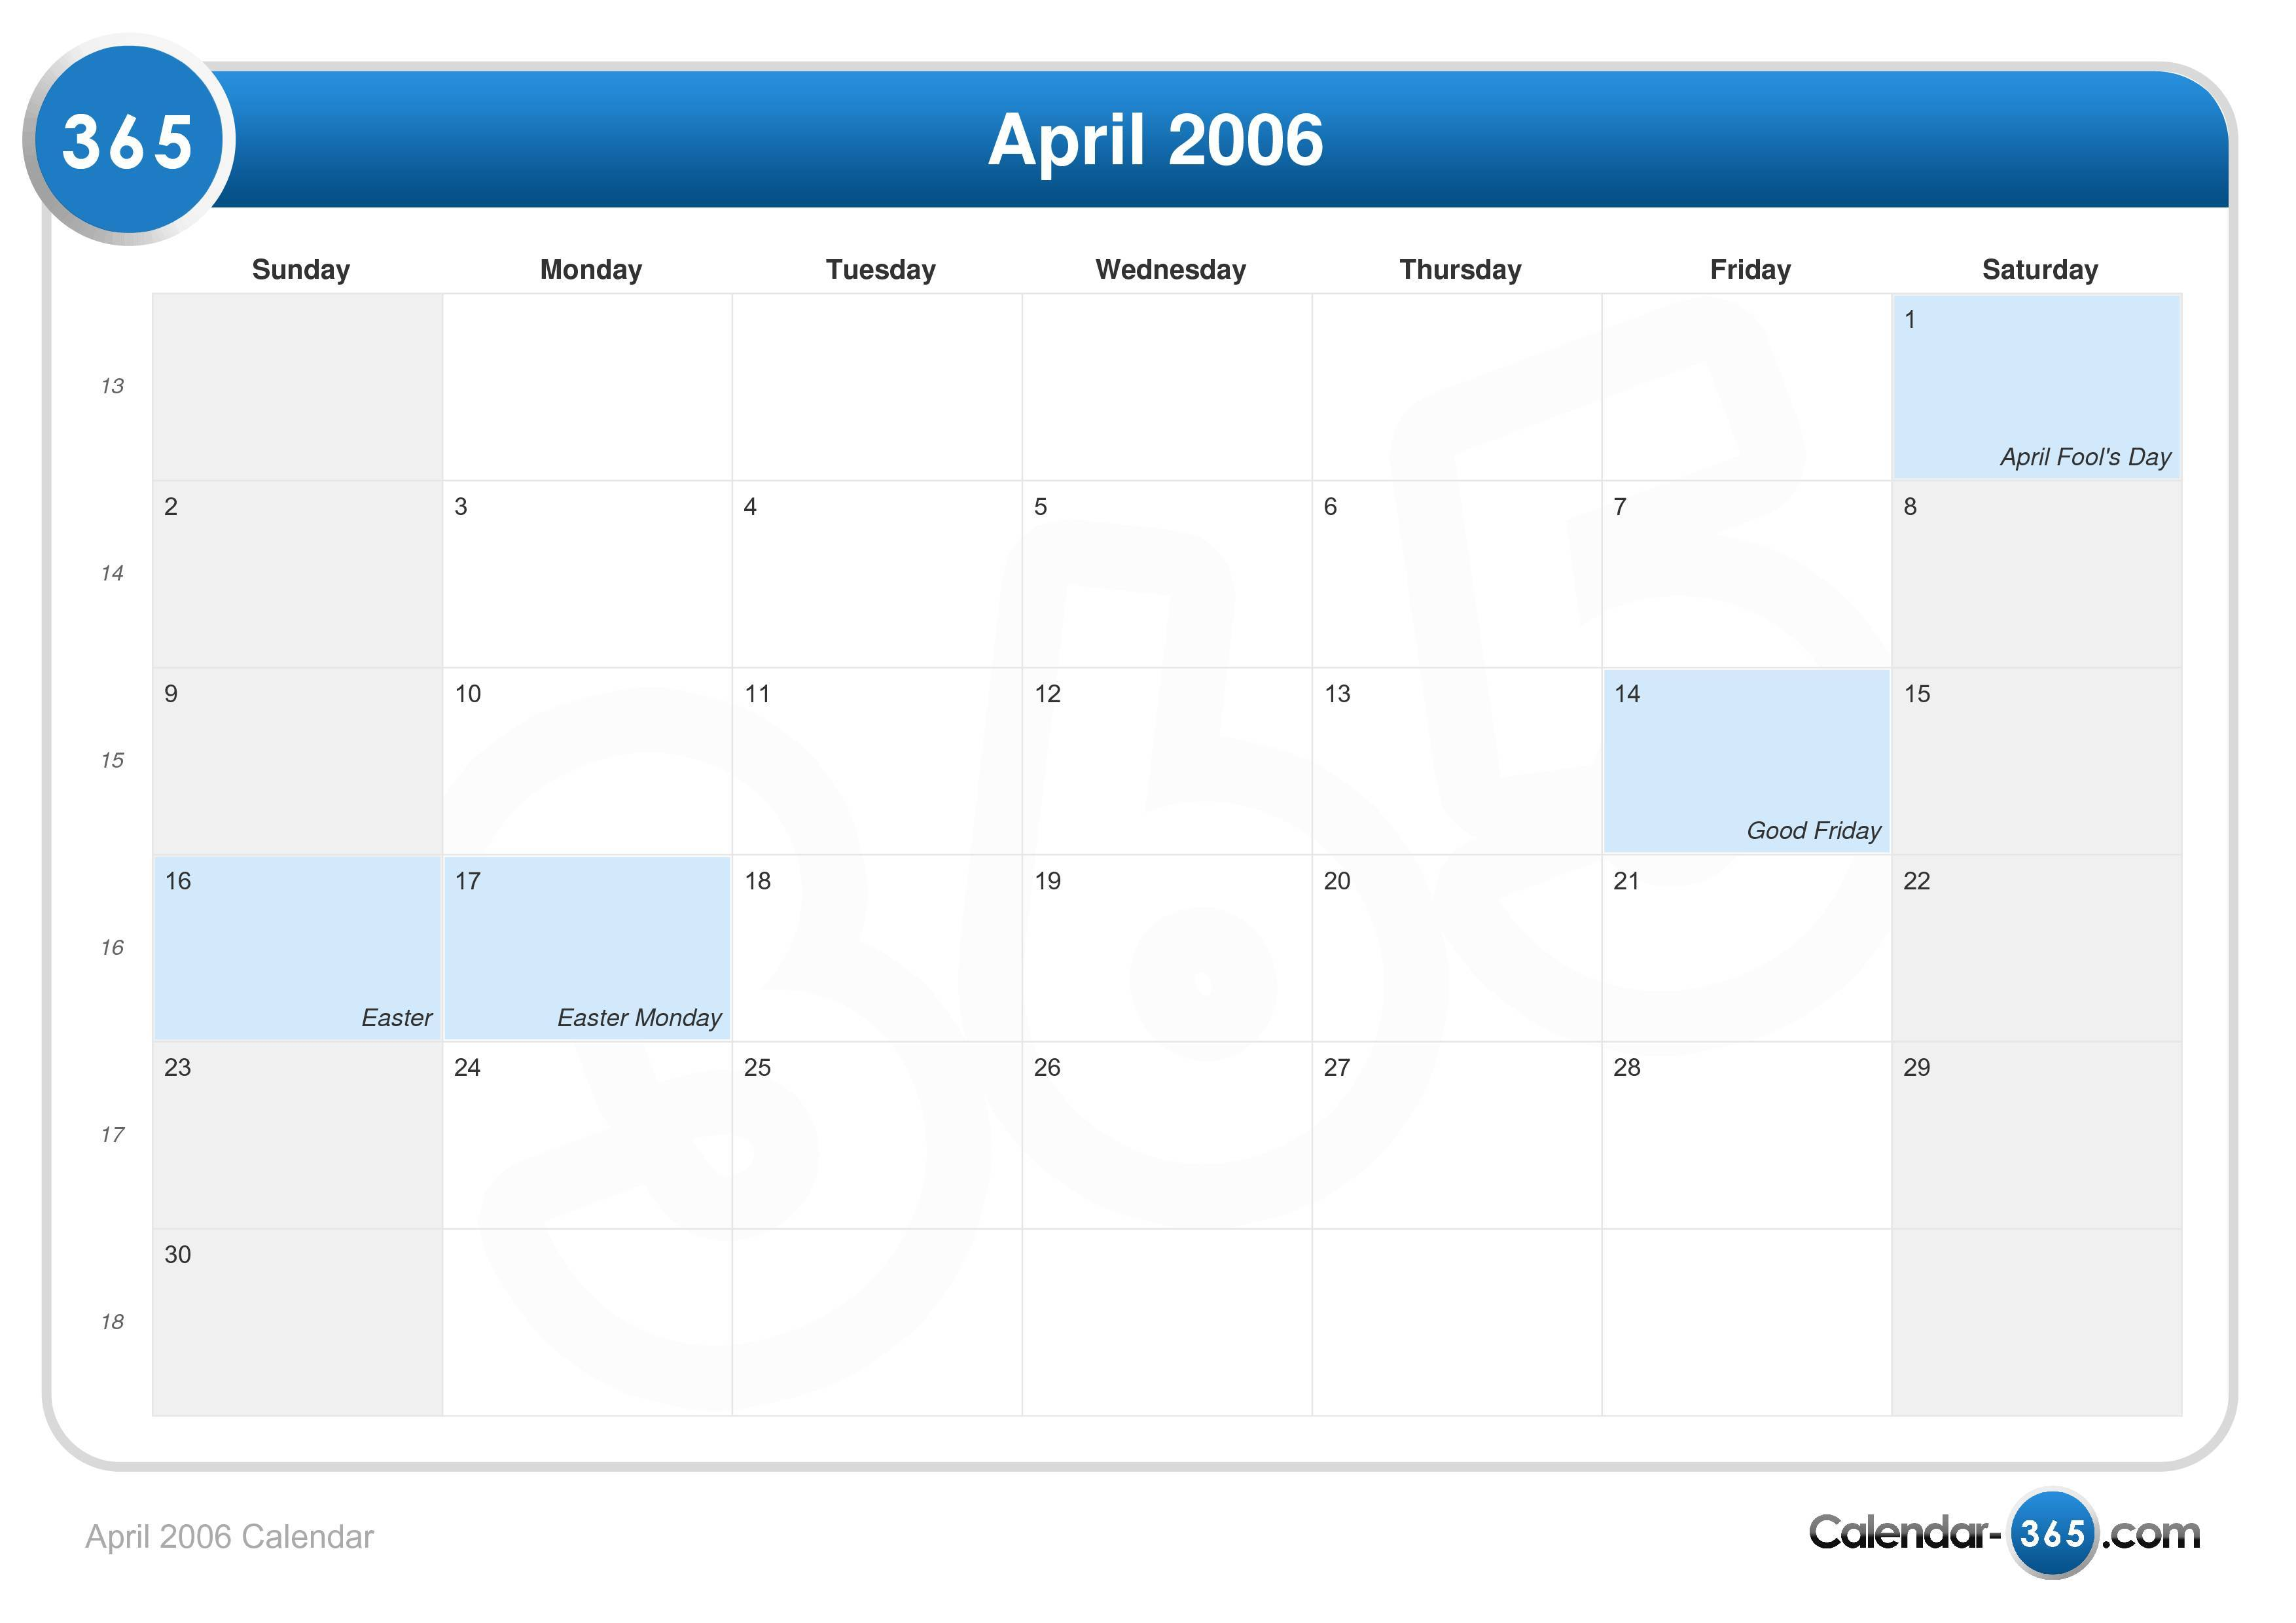 April 2006 Calendar